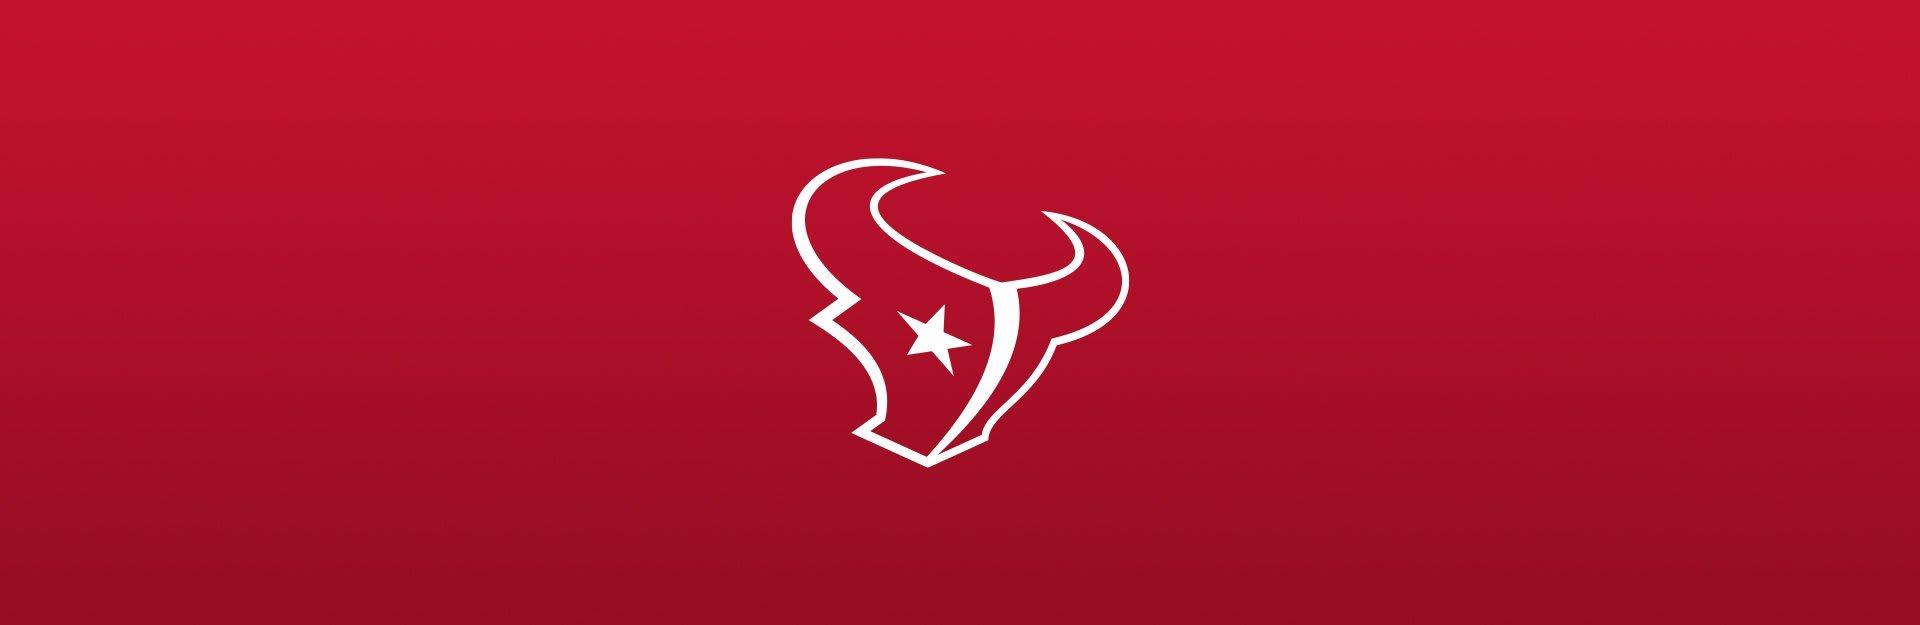 Houston Texans logo on red background